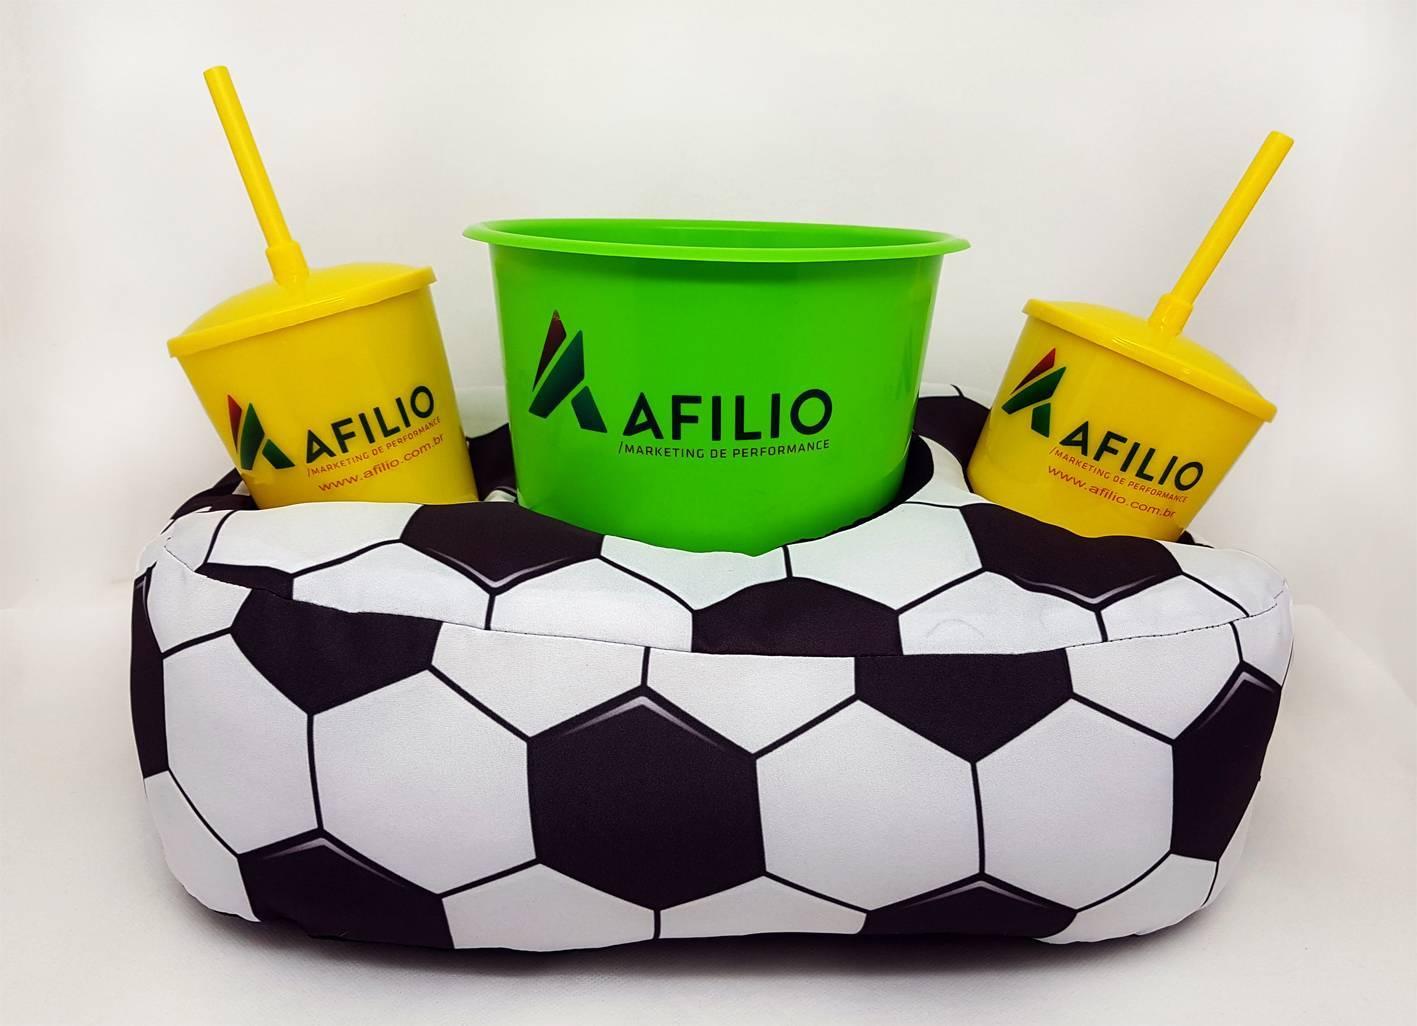 Almofada personalizada completa 2 copos e 1 balde - todos os - kmix estamparia